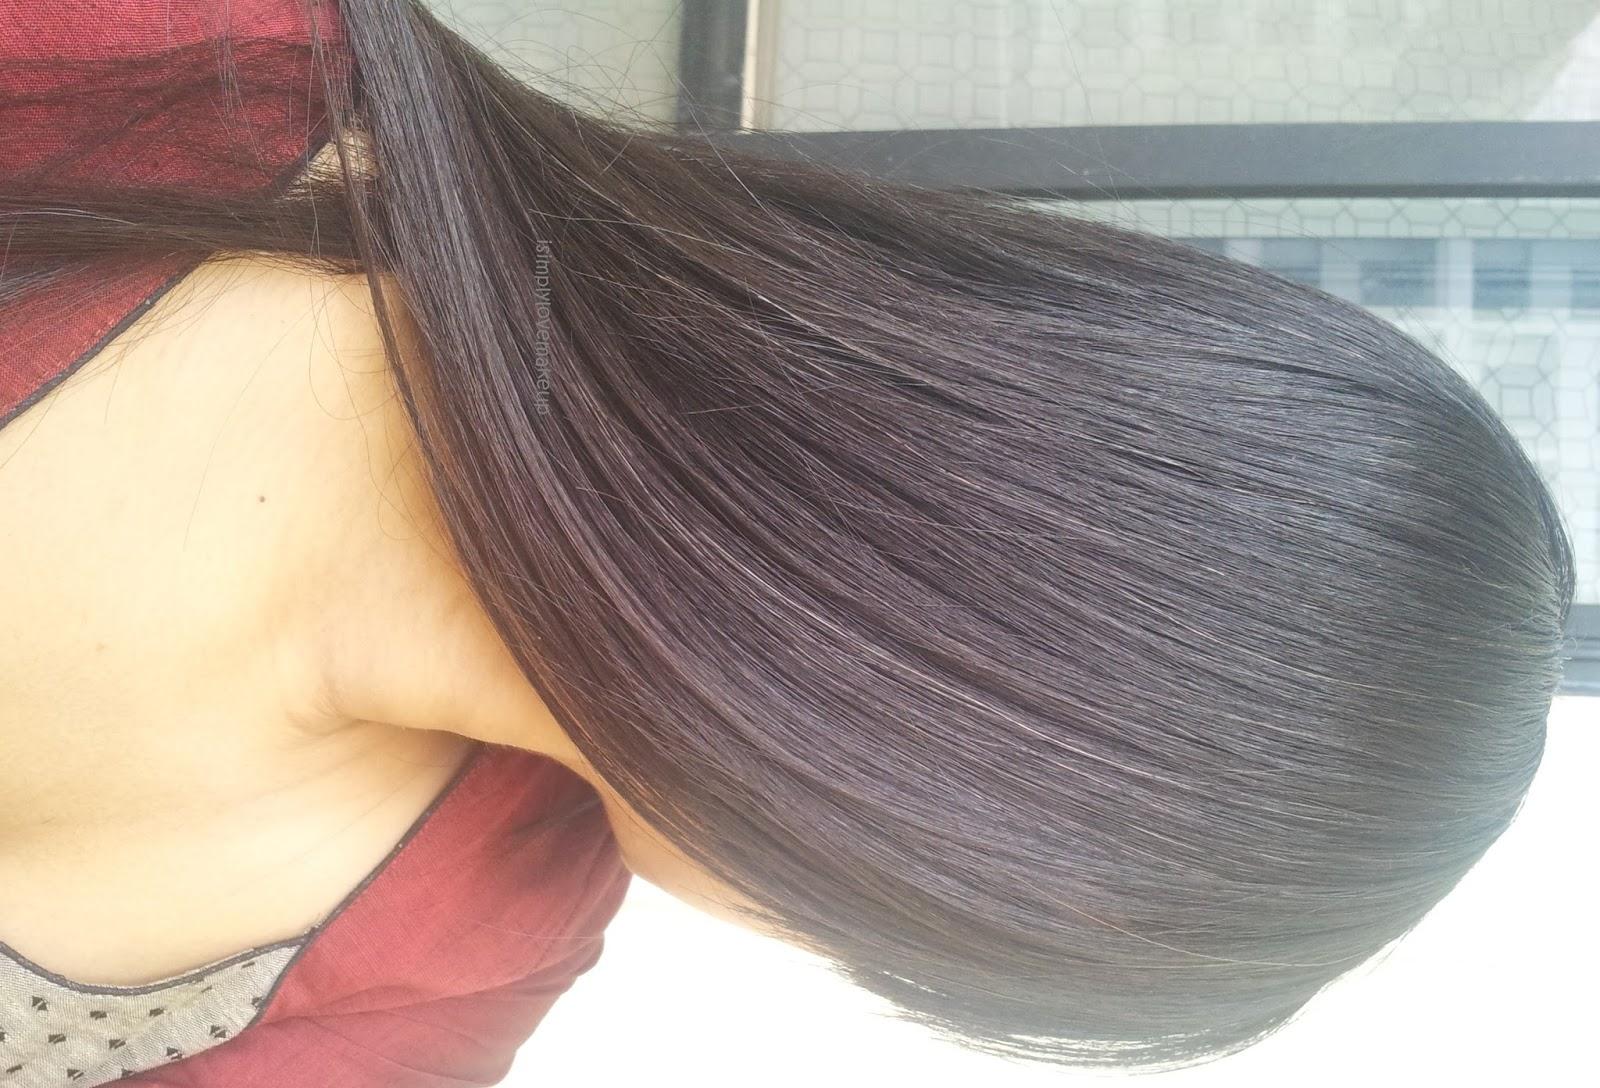 Black Cherry Hair Hair swatch